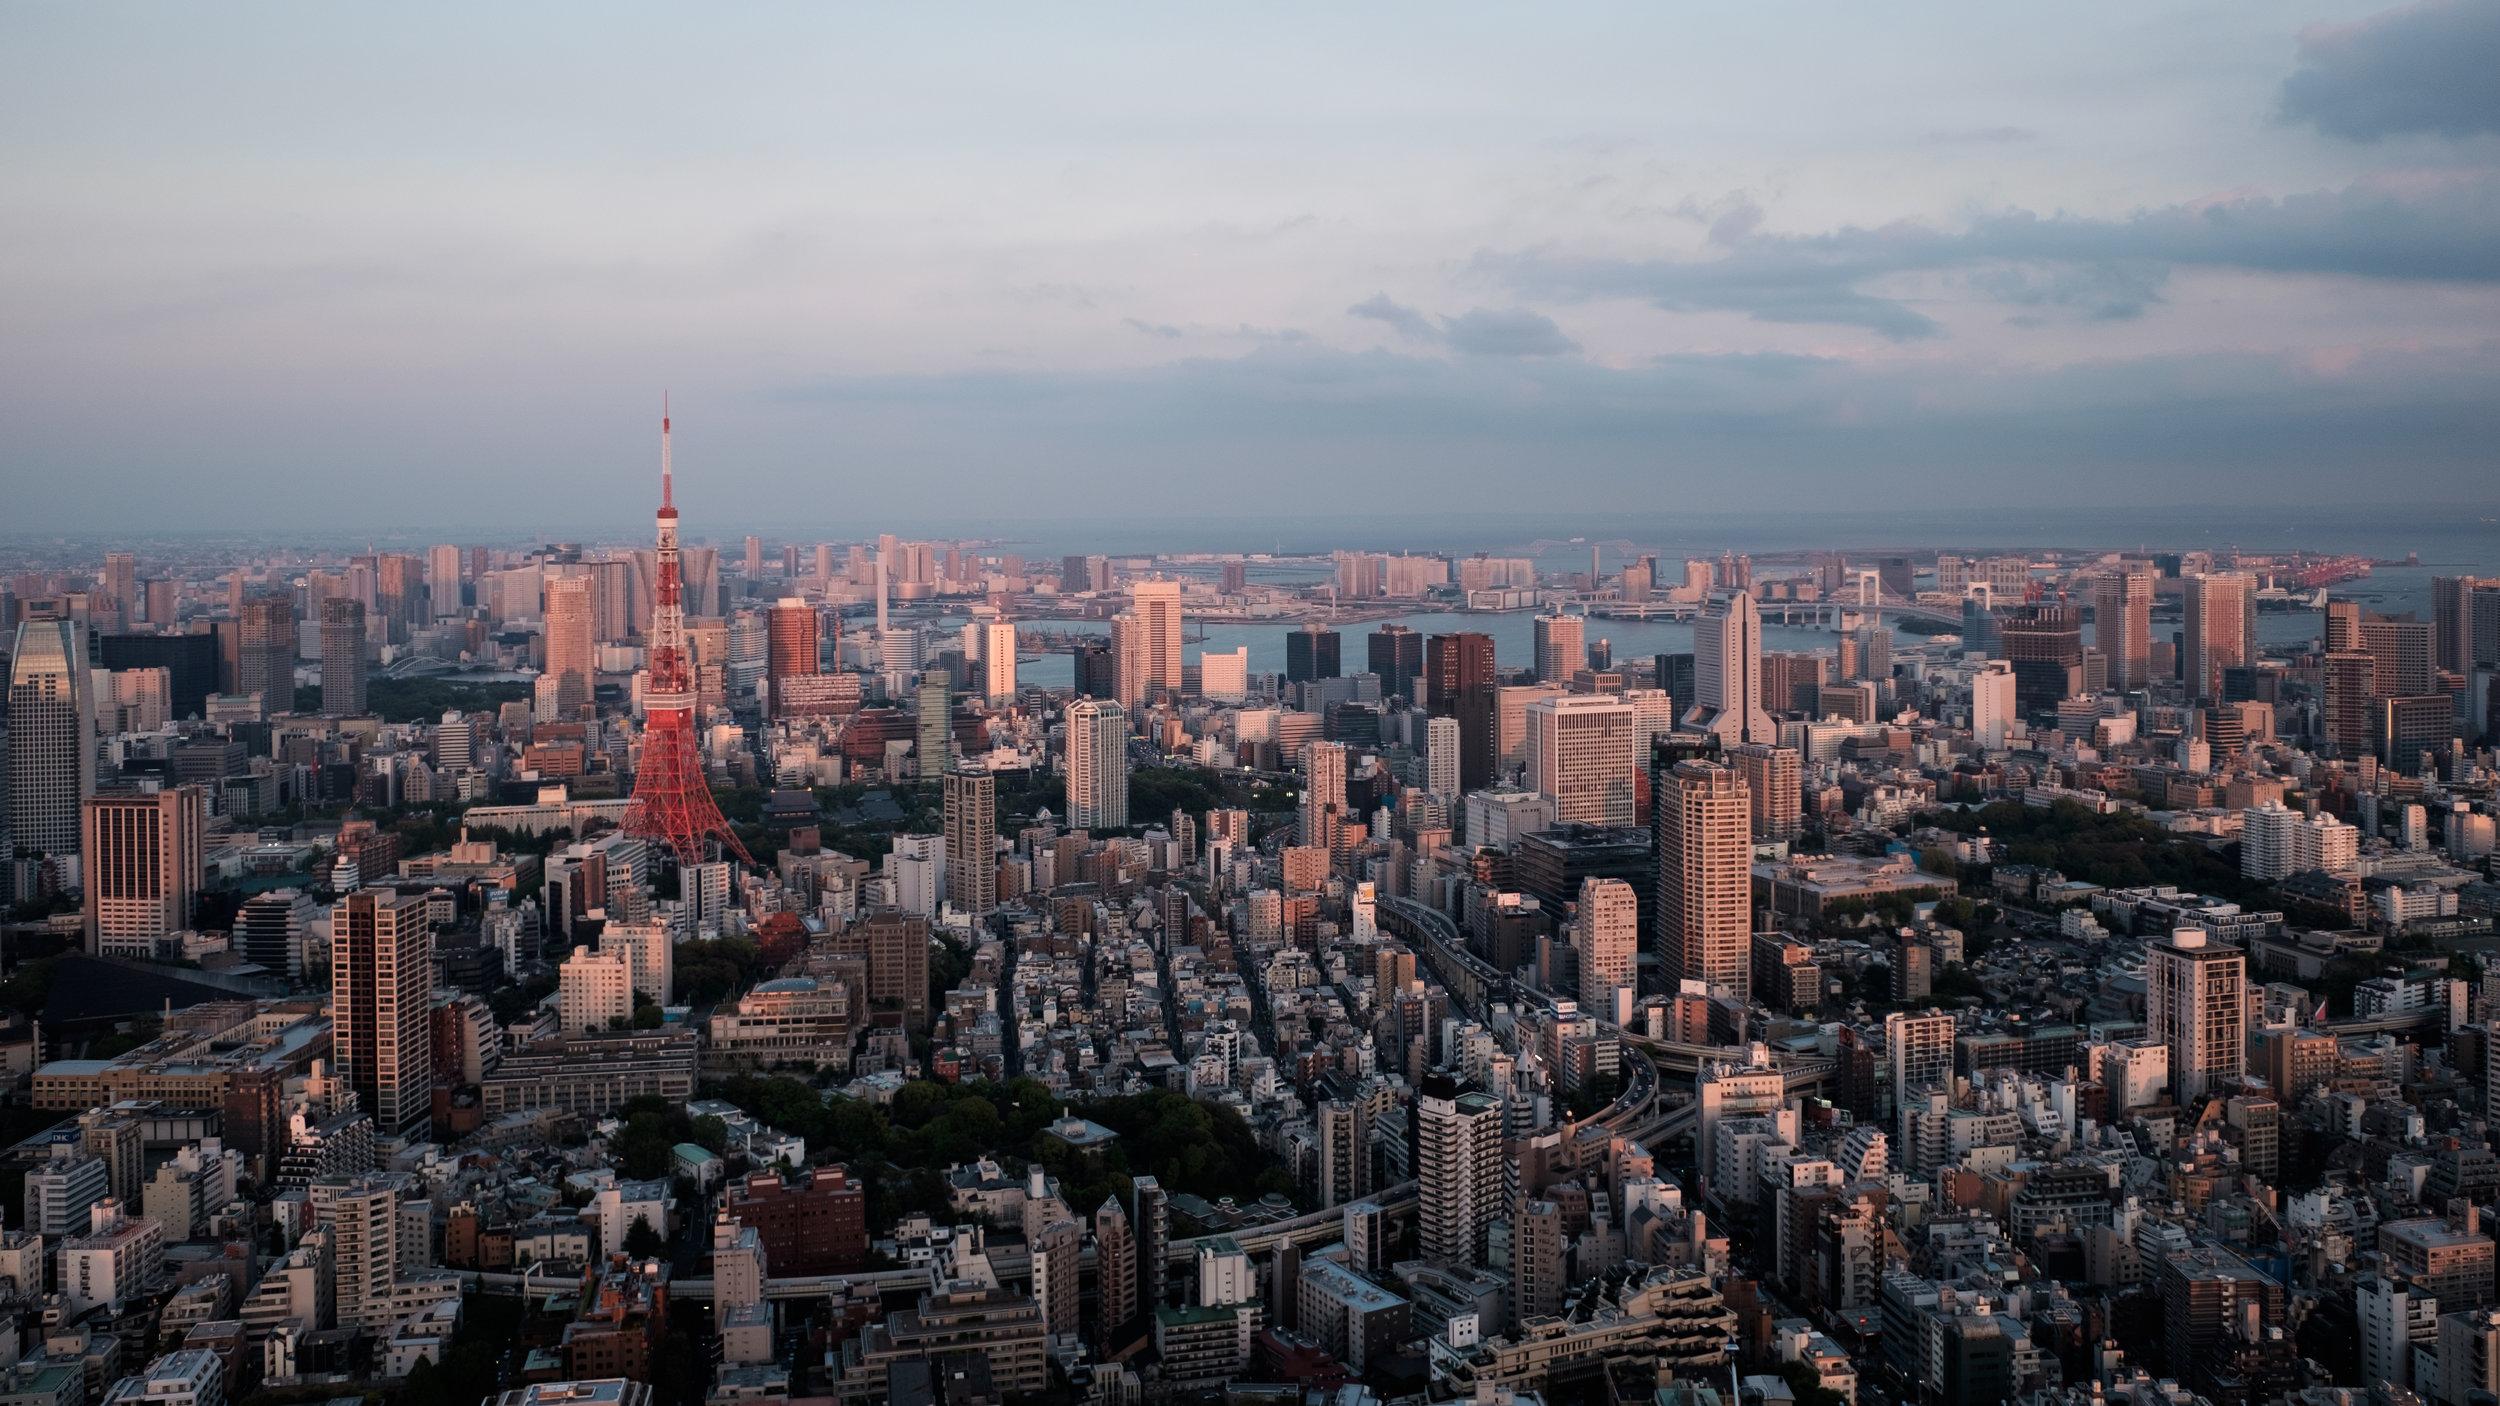 Top of Mori Tower (I)